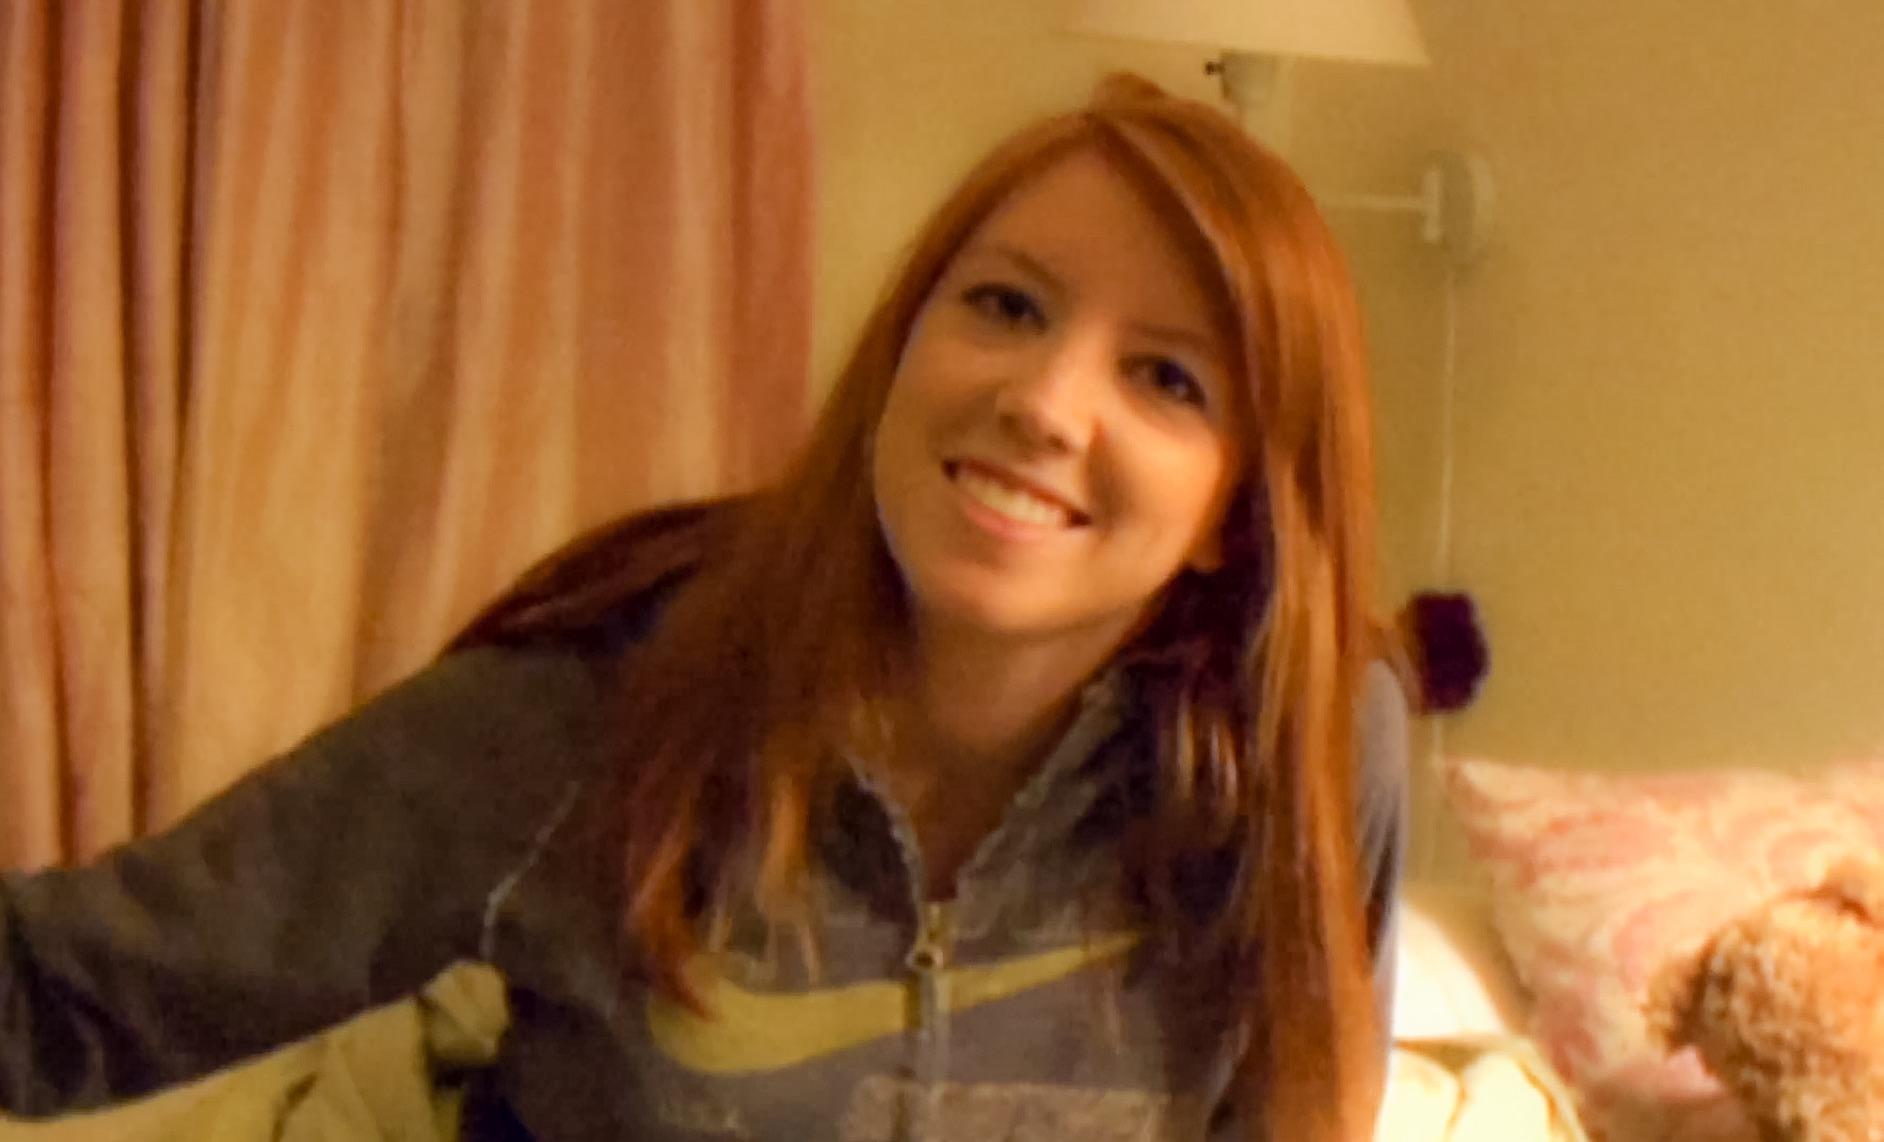 Audrey Wauchope Wiki >> Audrey Wauchope | Crazy Ex-Girlfriend Wiki | FANDOM powered by Wikia